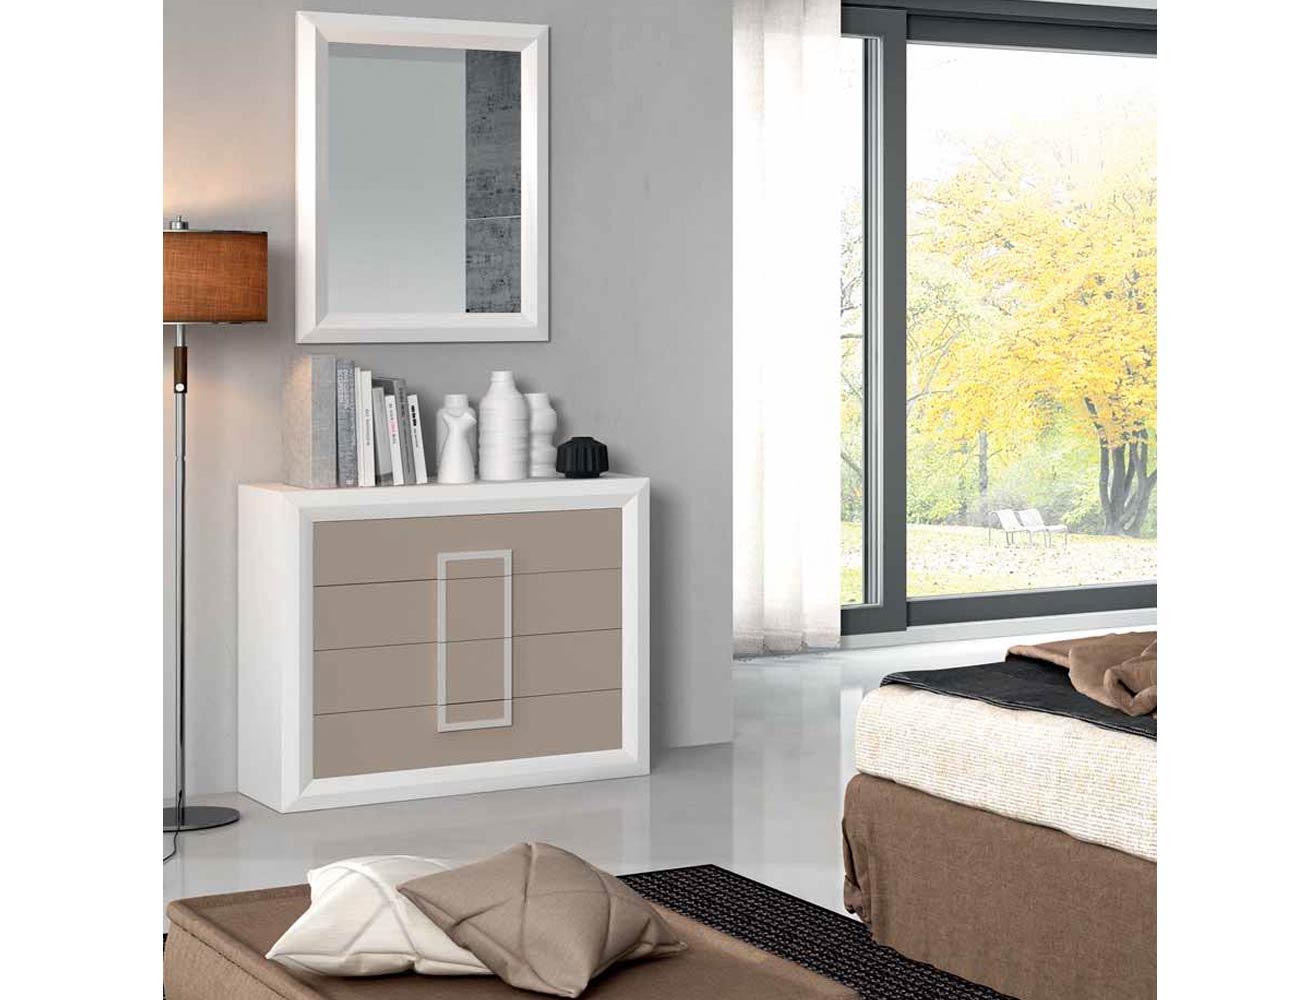 C moda con marco espejo para dormitorio de matrimonio for Comodas dormitorio matrimonio